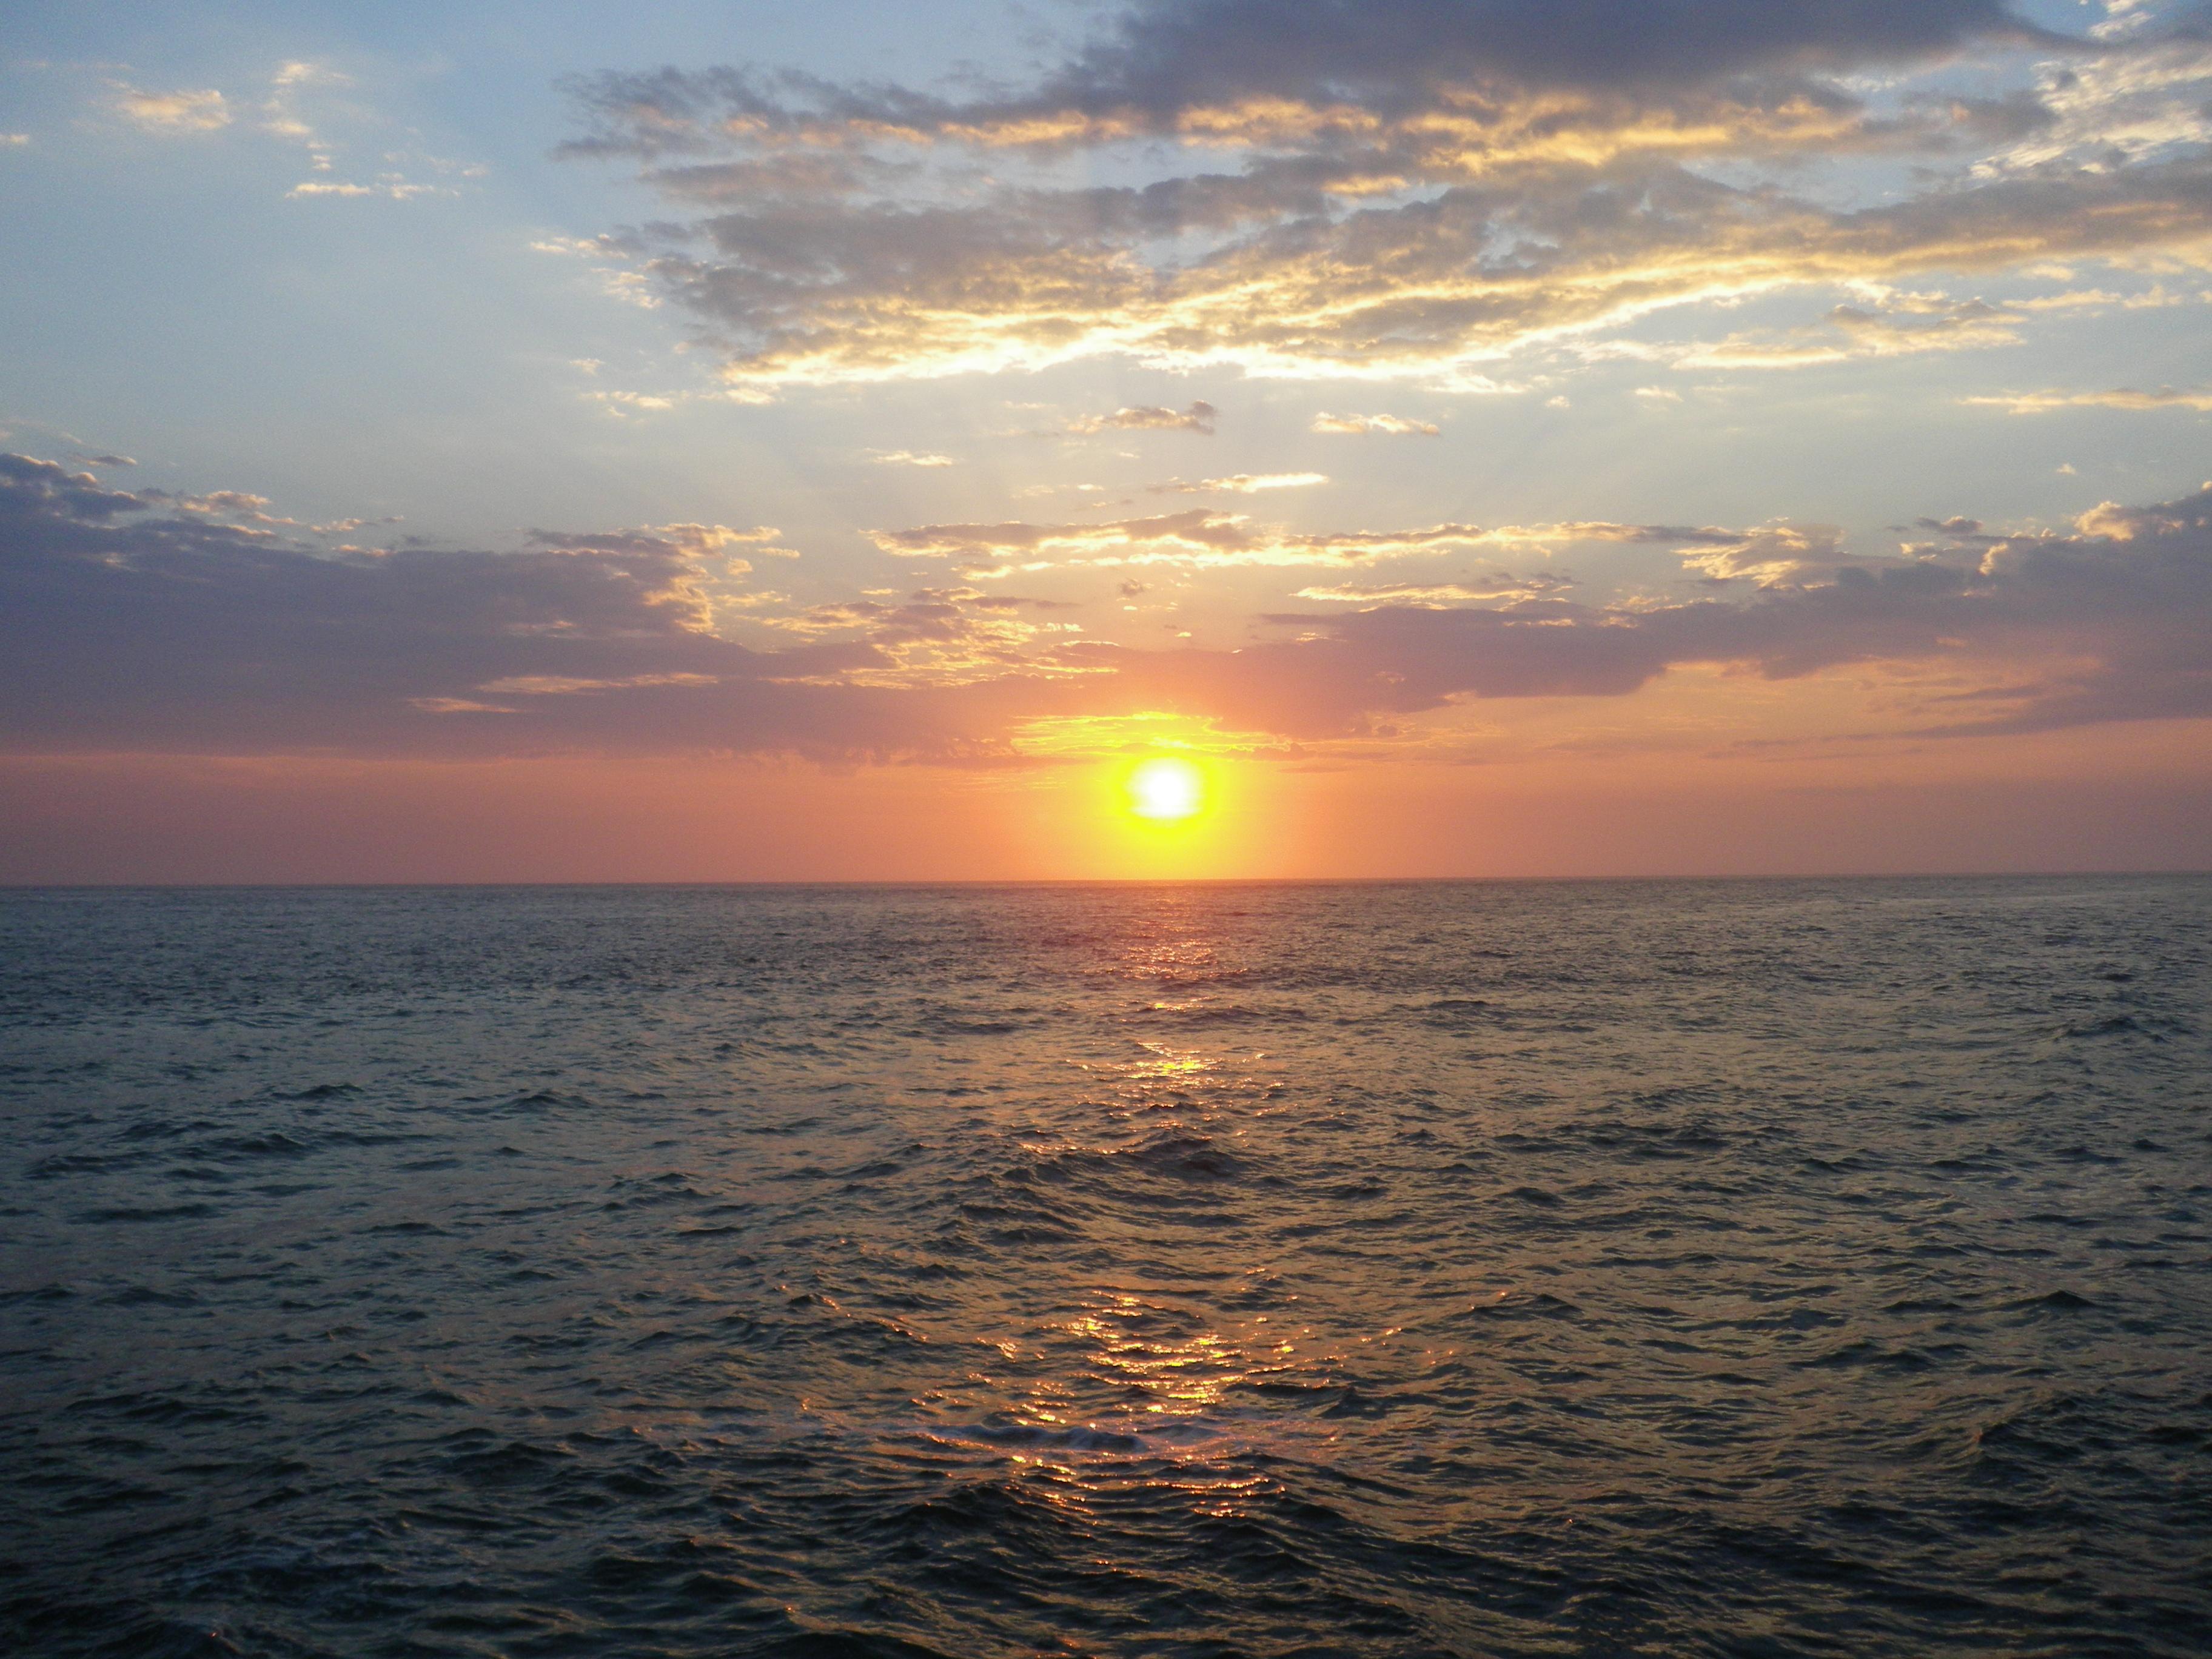 Another fantastic sunrise